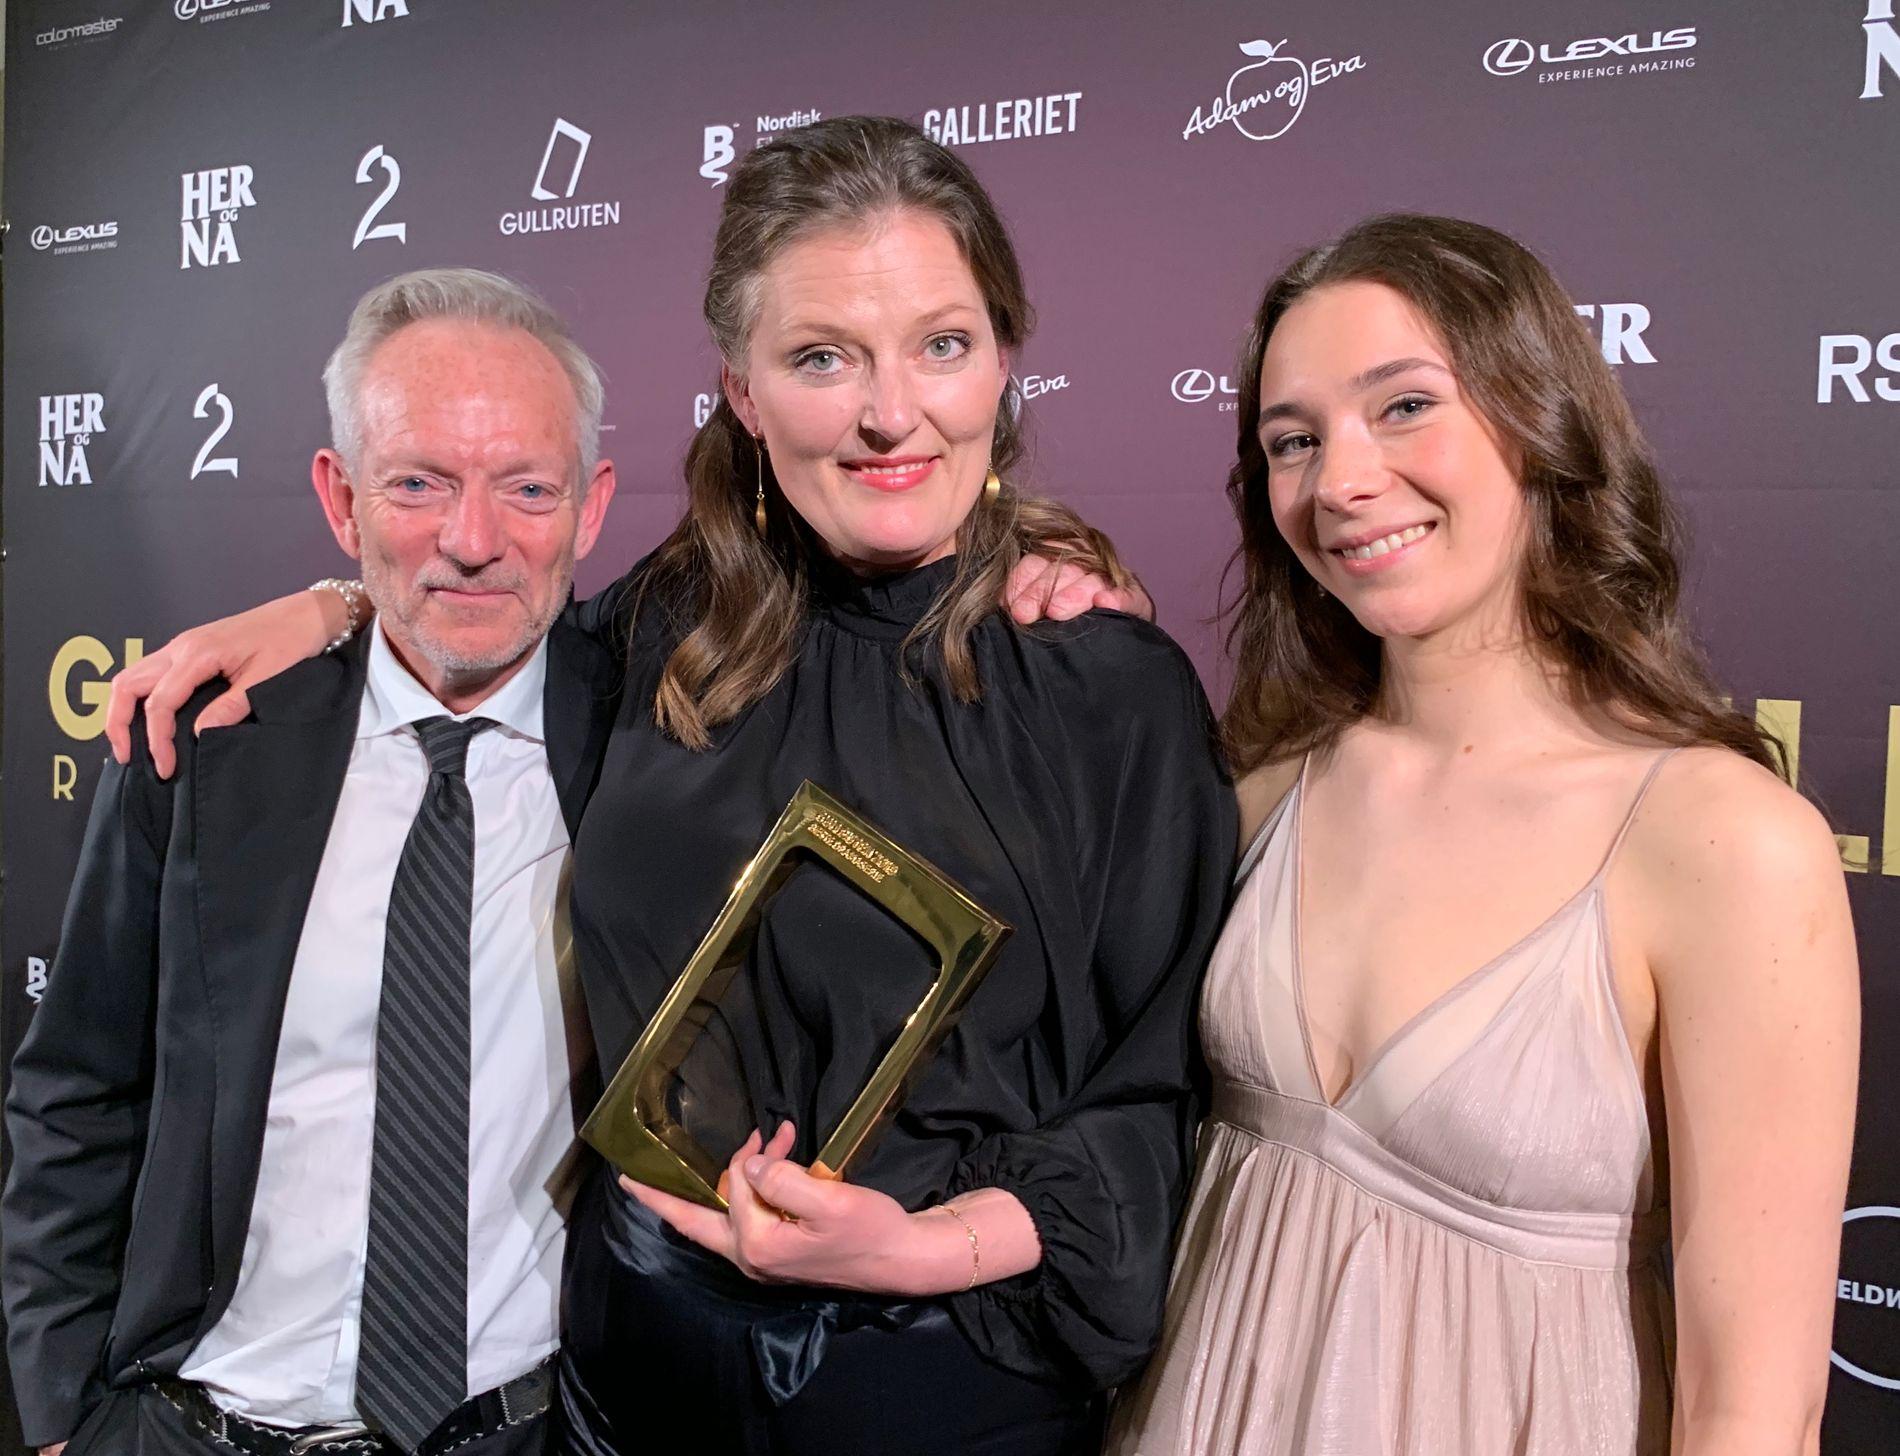 TO PRISER: Det ble to priser til «Lykkeland» lørdag kveld. Fra venstre: Petter Næss, Synnøve Hørsdal og skuespiller Anne Regine Ellingsæter.